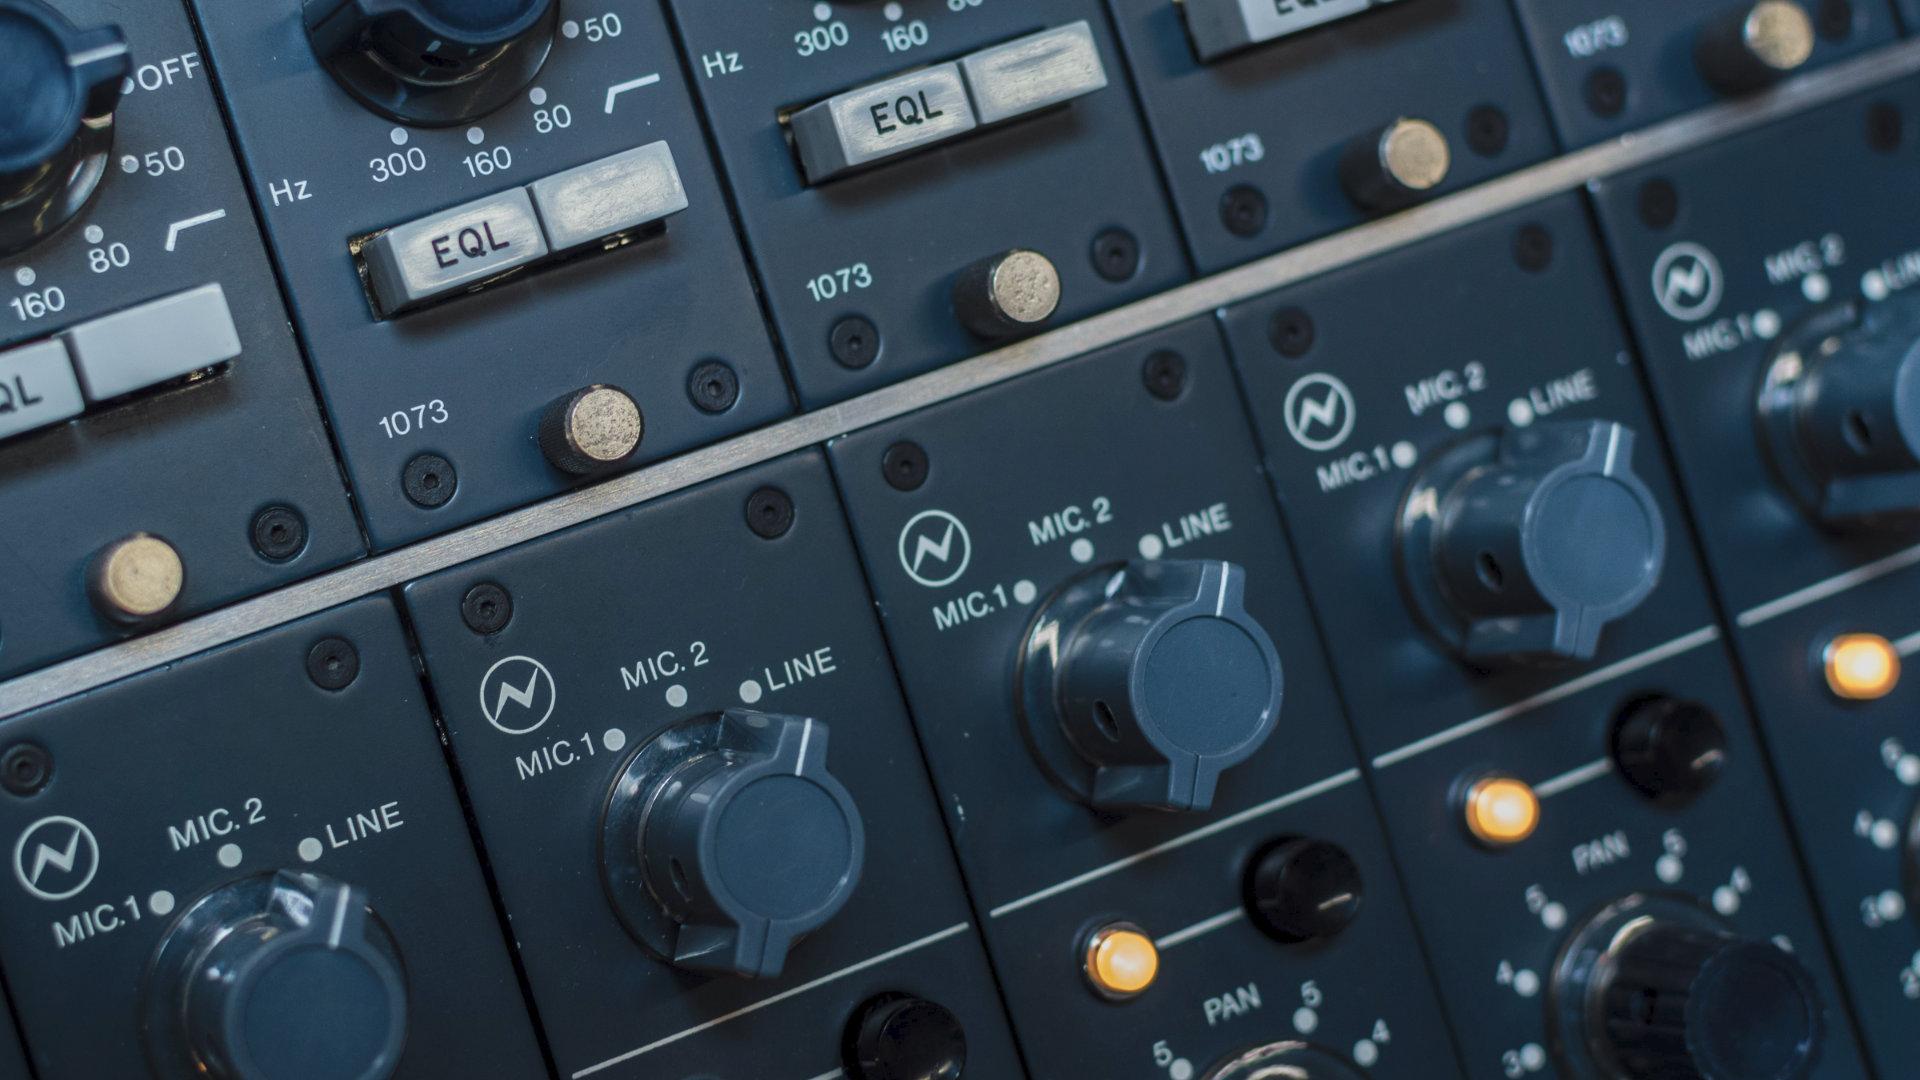 how to mix and master music in logic pro x - decibel peak